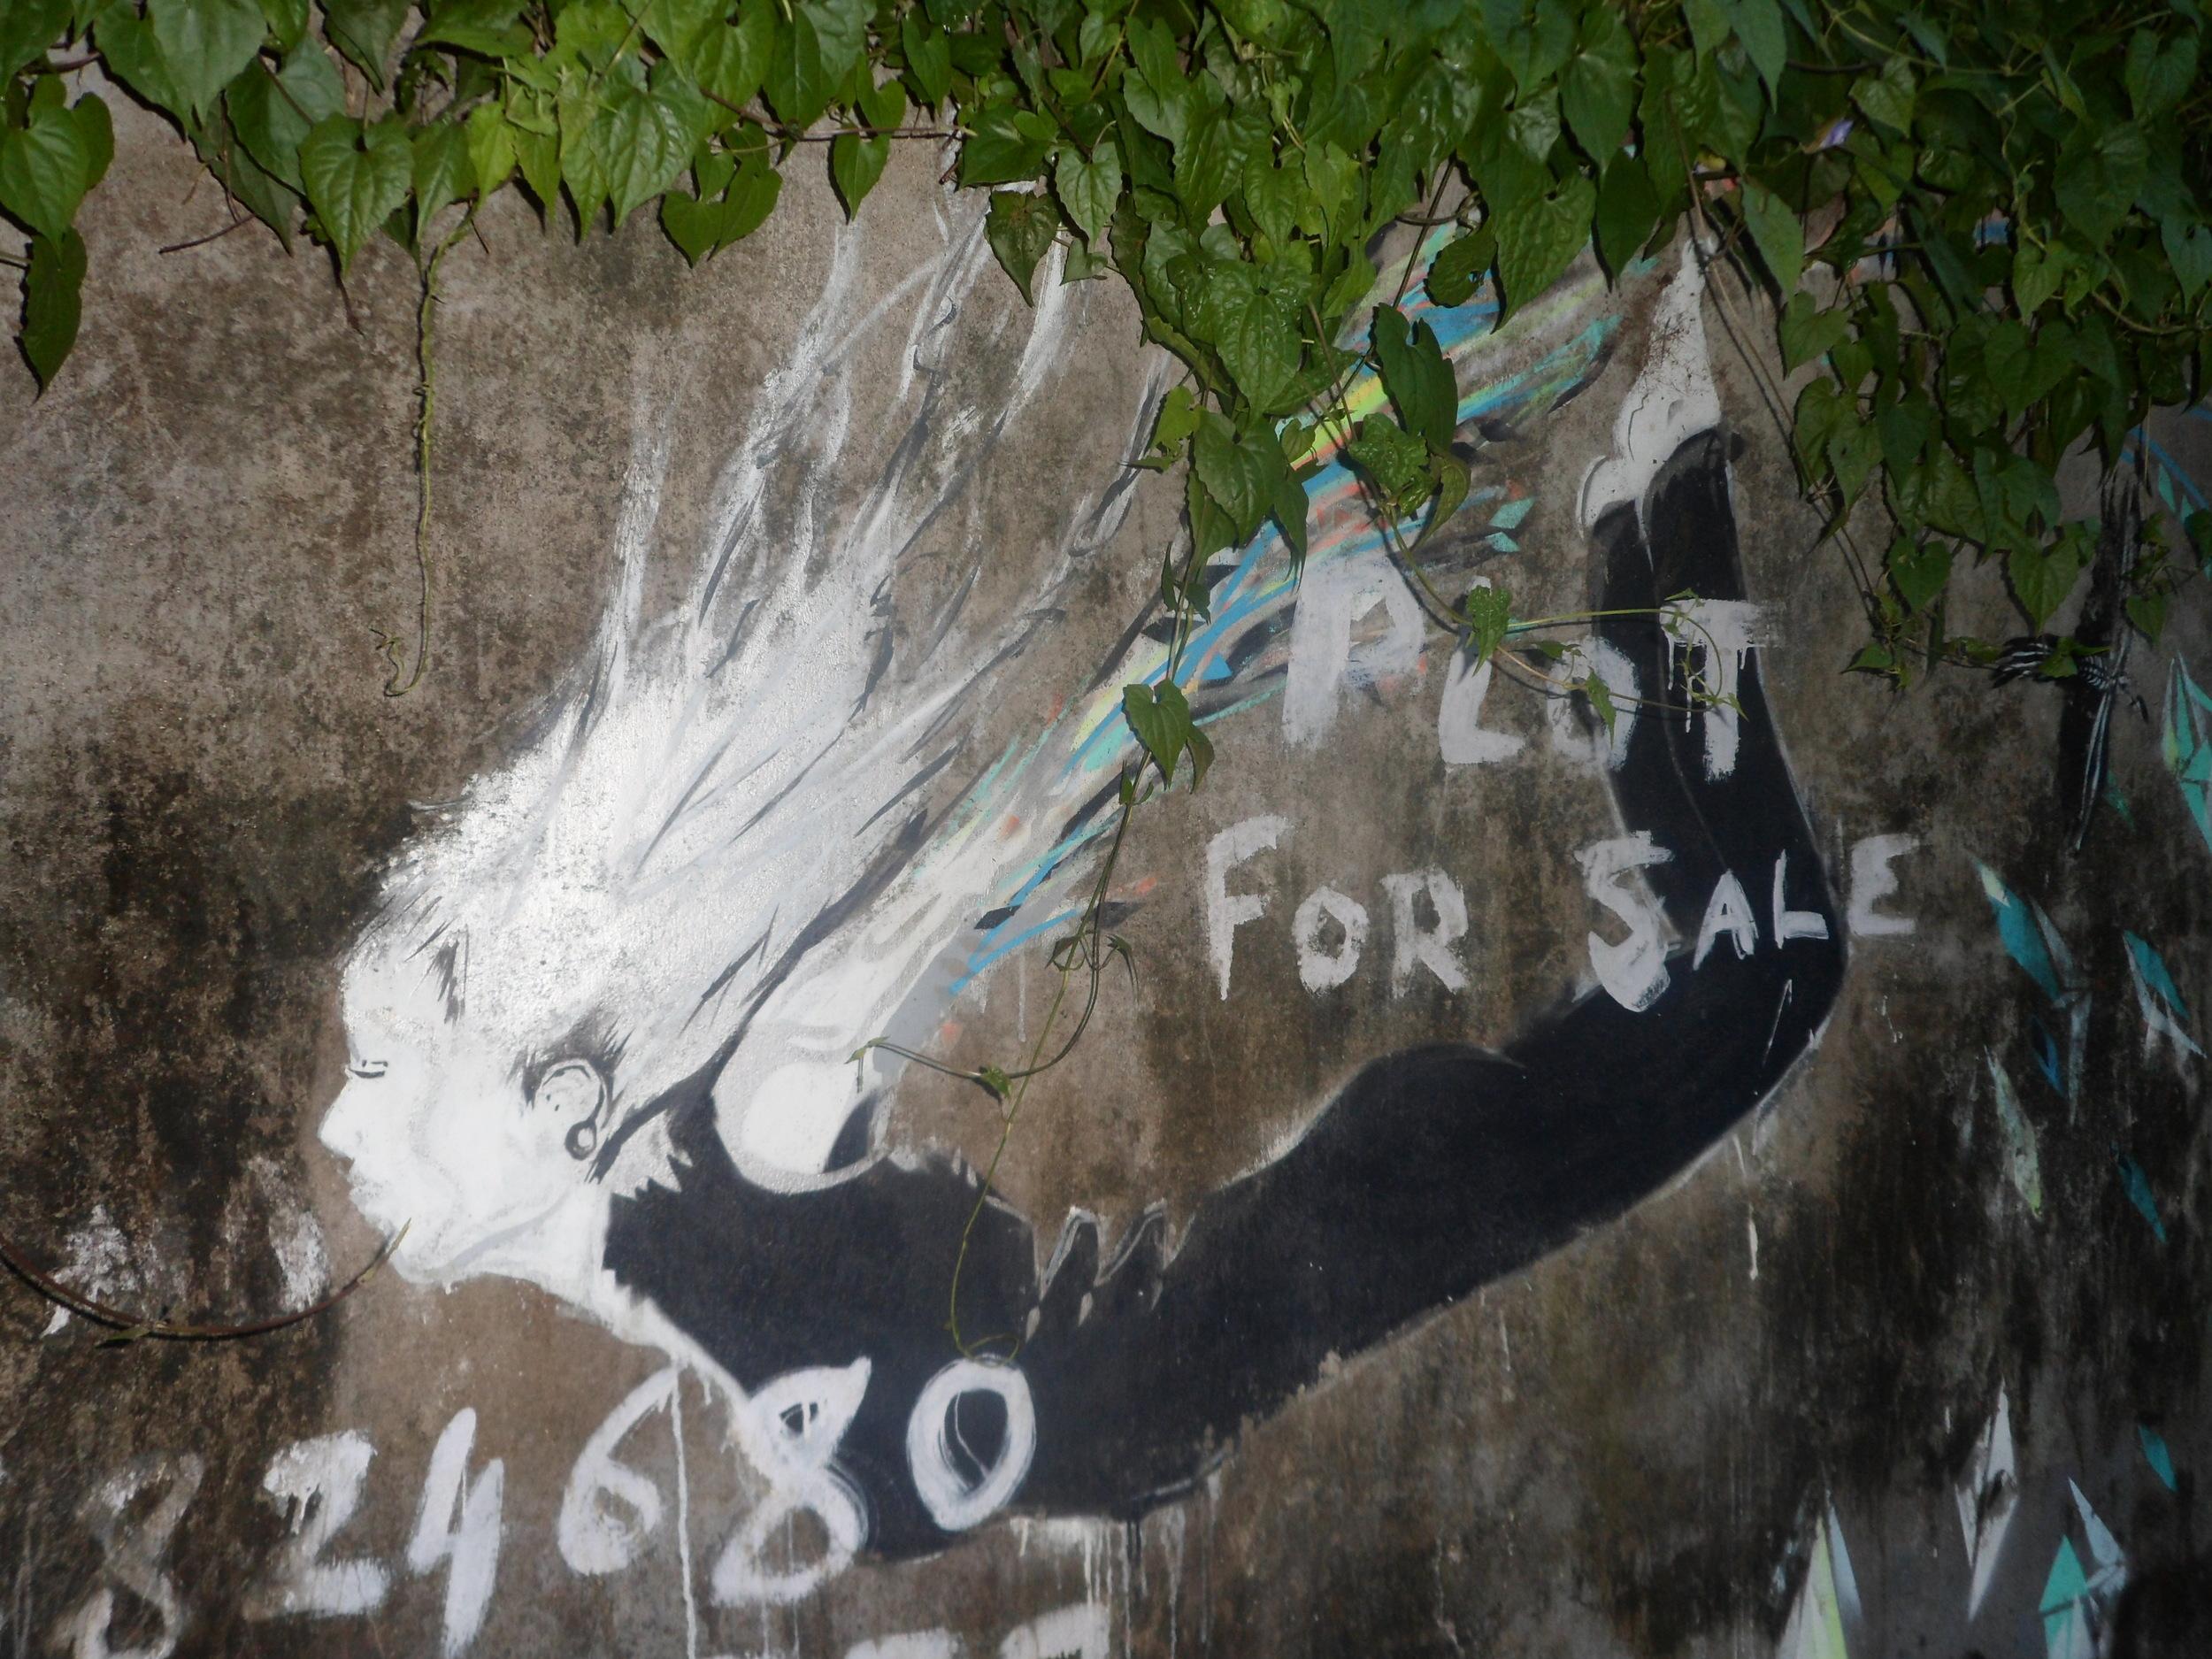 street-art-fort-kochi-india-2